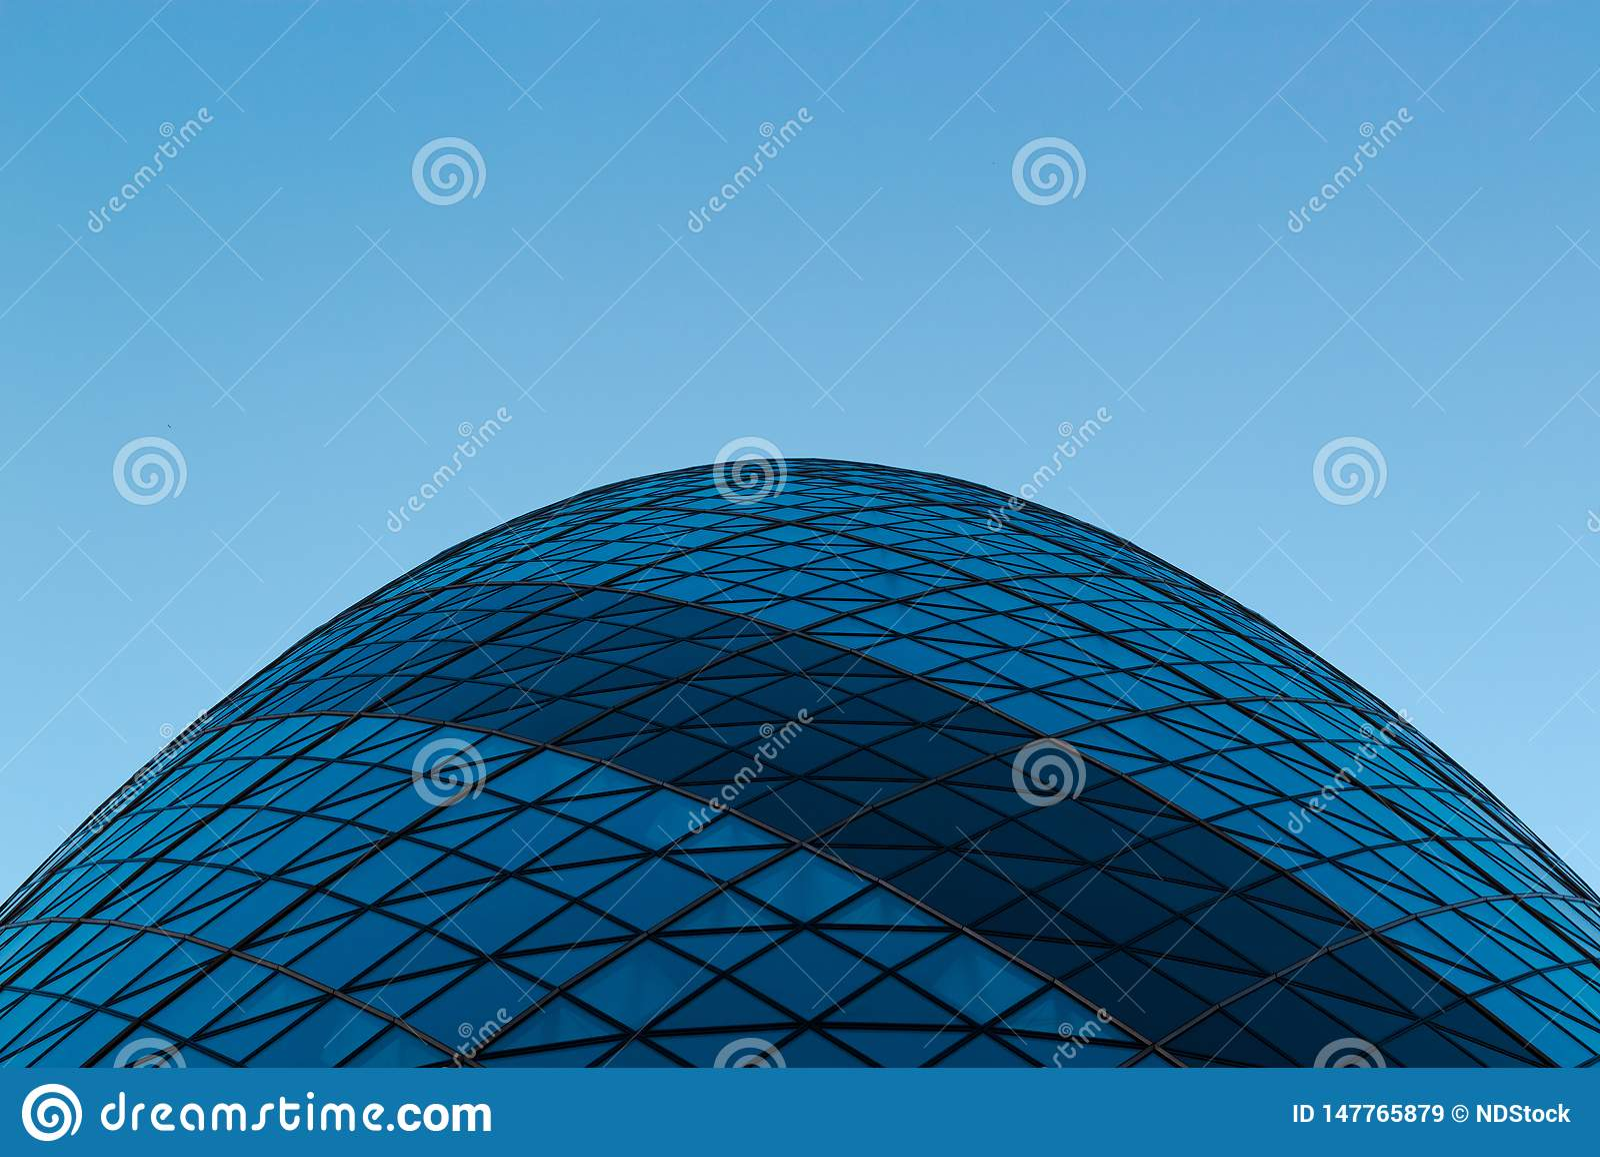 Sir Norman Foster Building The Gherkin Photo de dessous